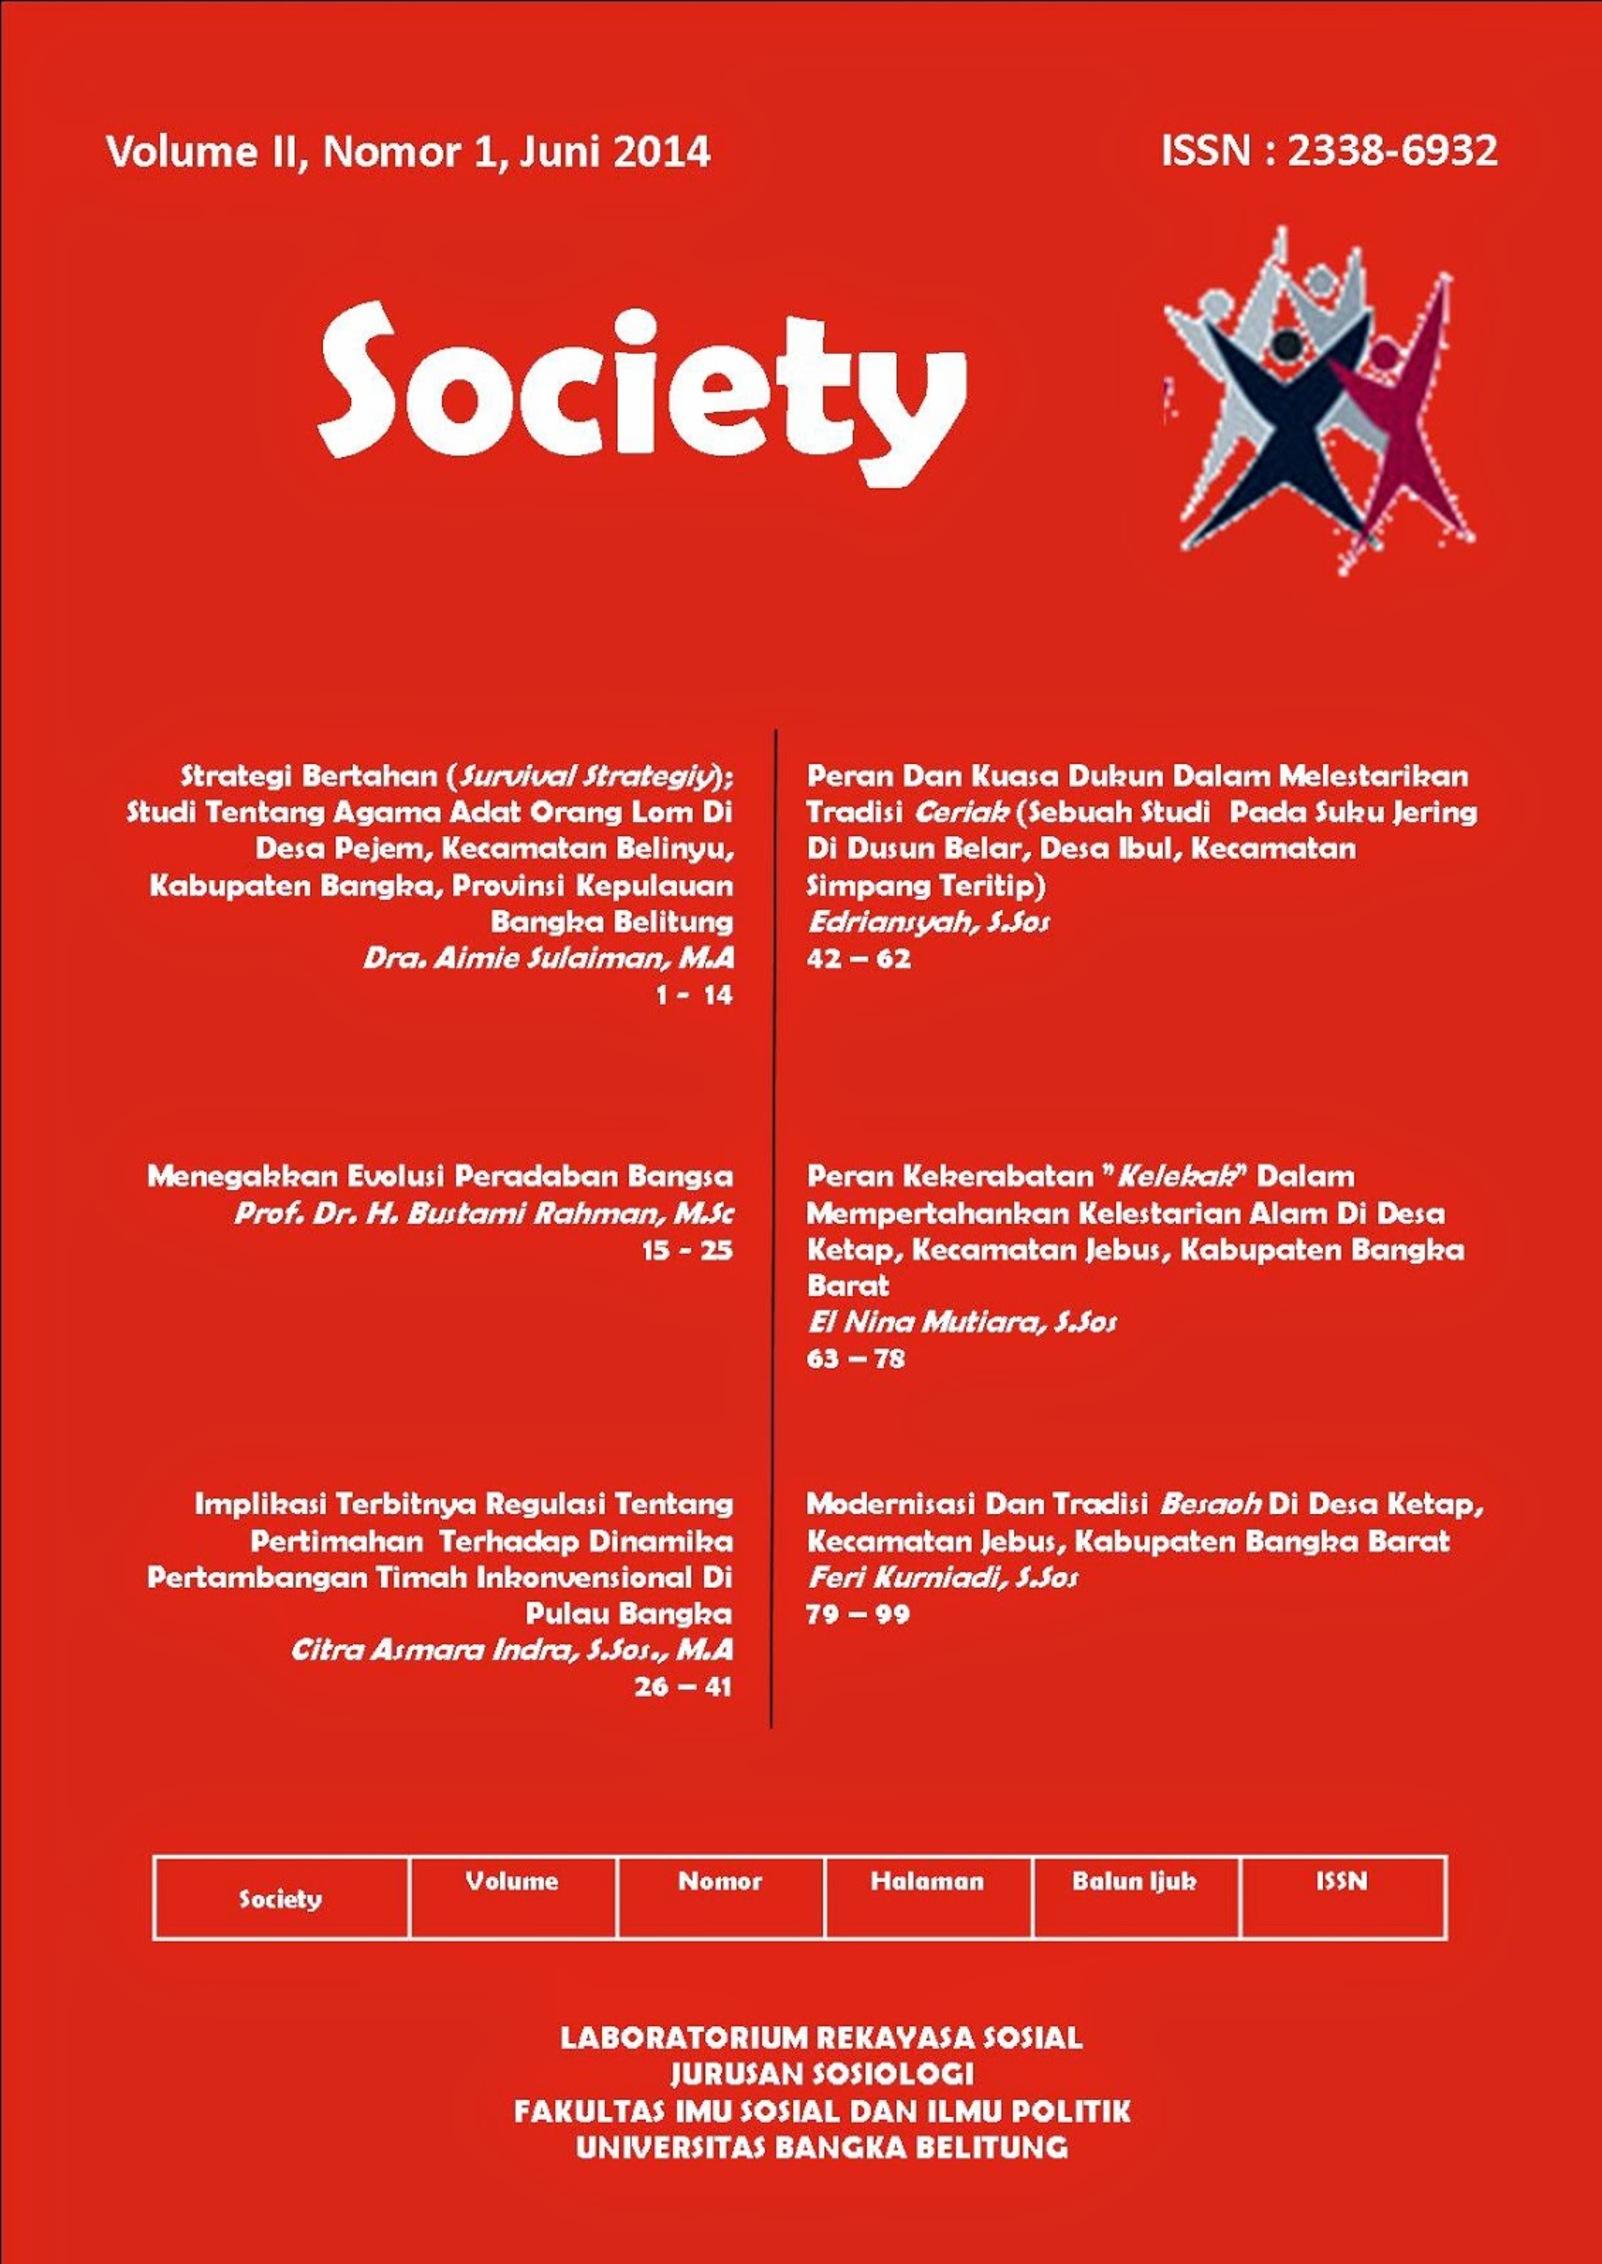 Jurnal Society Volume 2 Nomor 1#Juni 2014